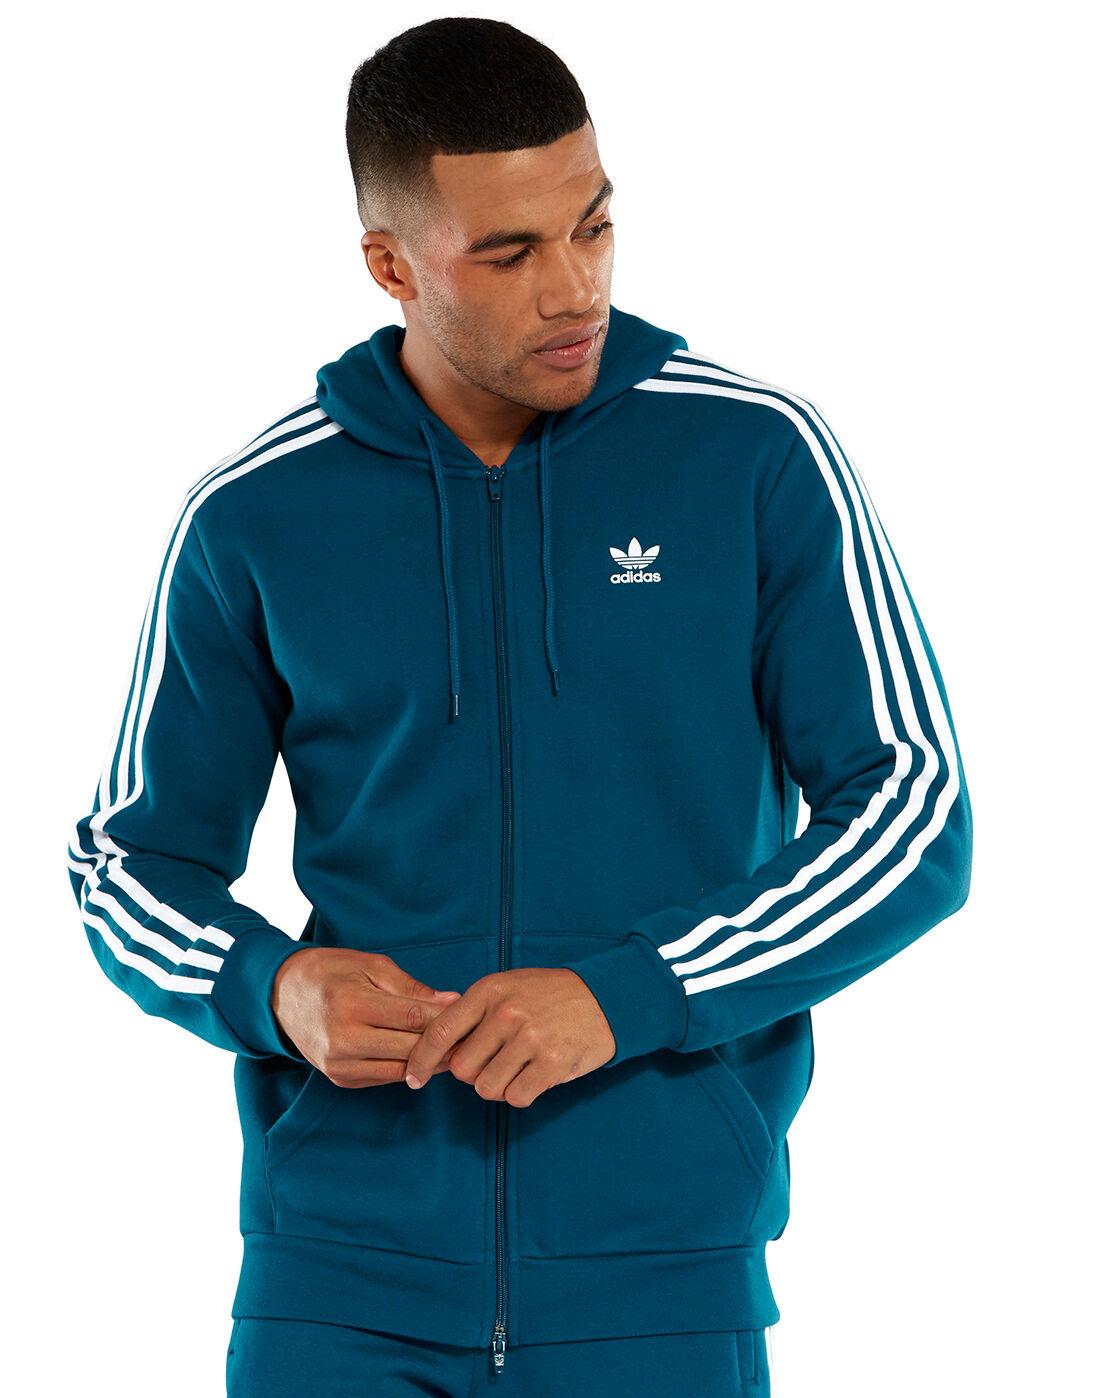 adidas Originals Mens 3 Stripes Full Zip Hoodie | Life Style